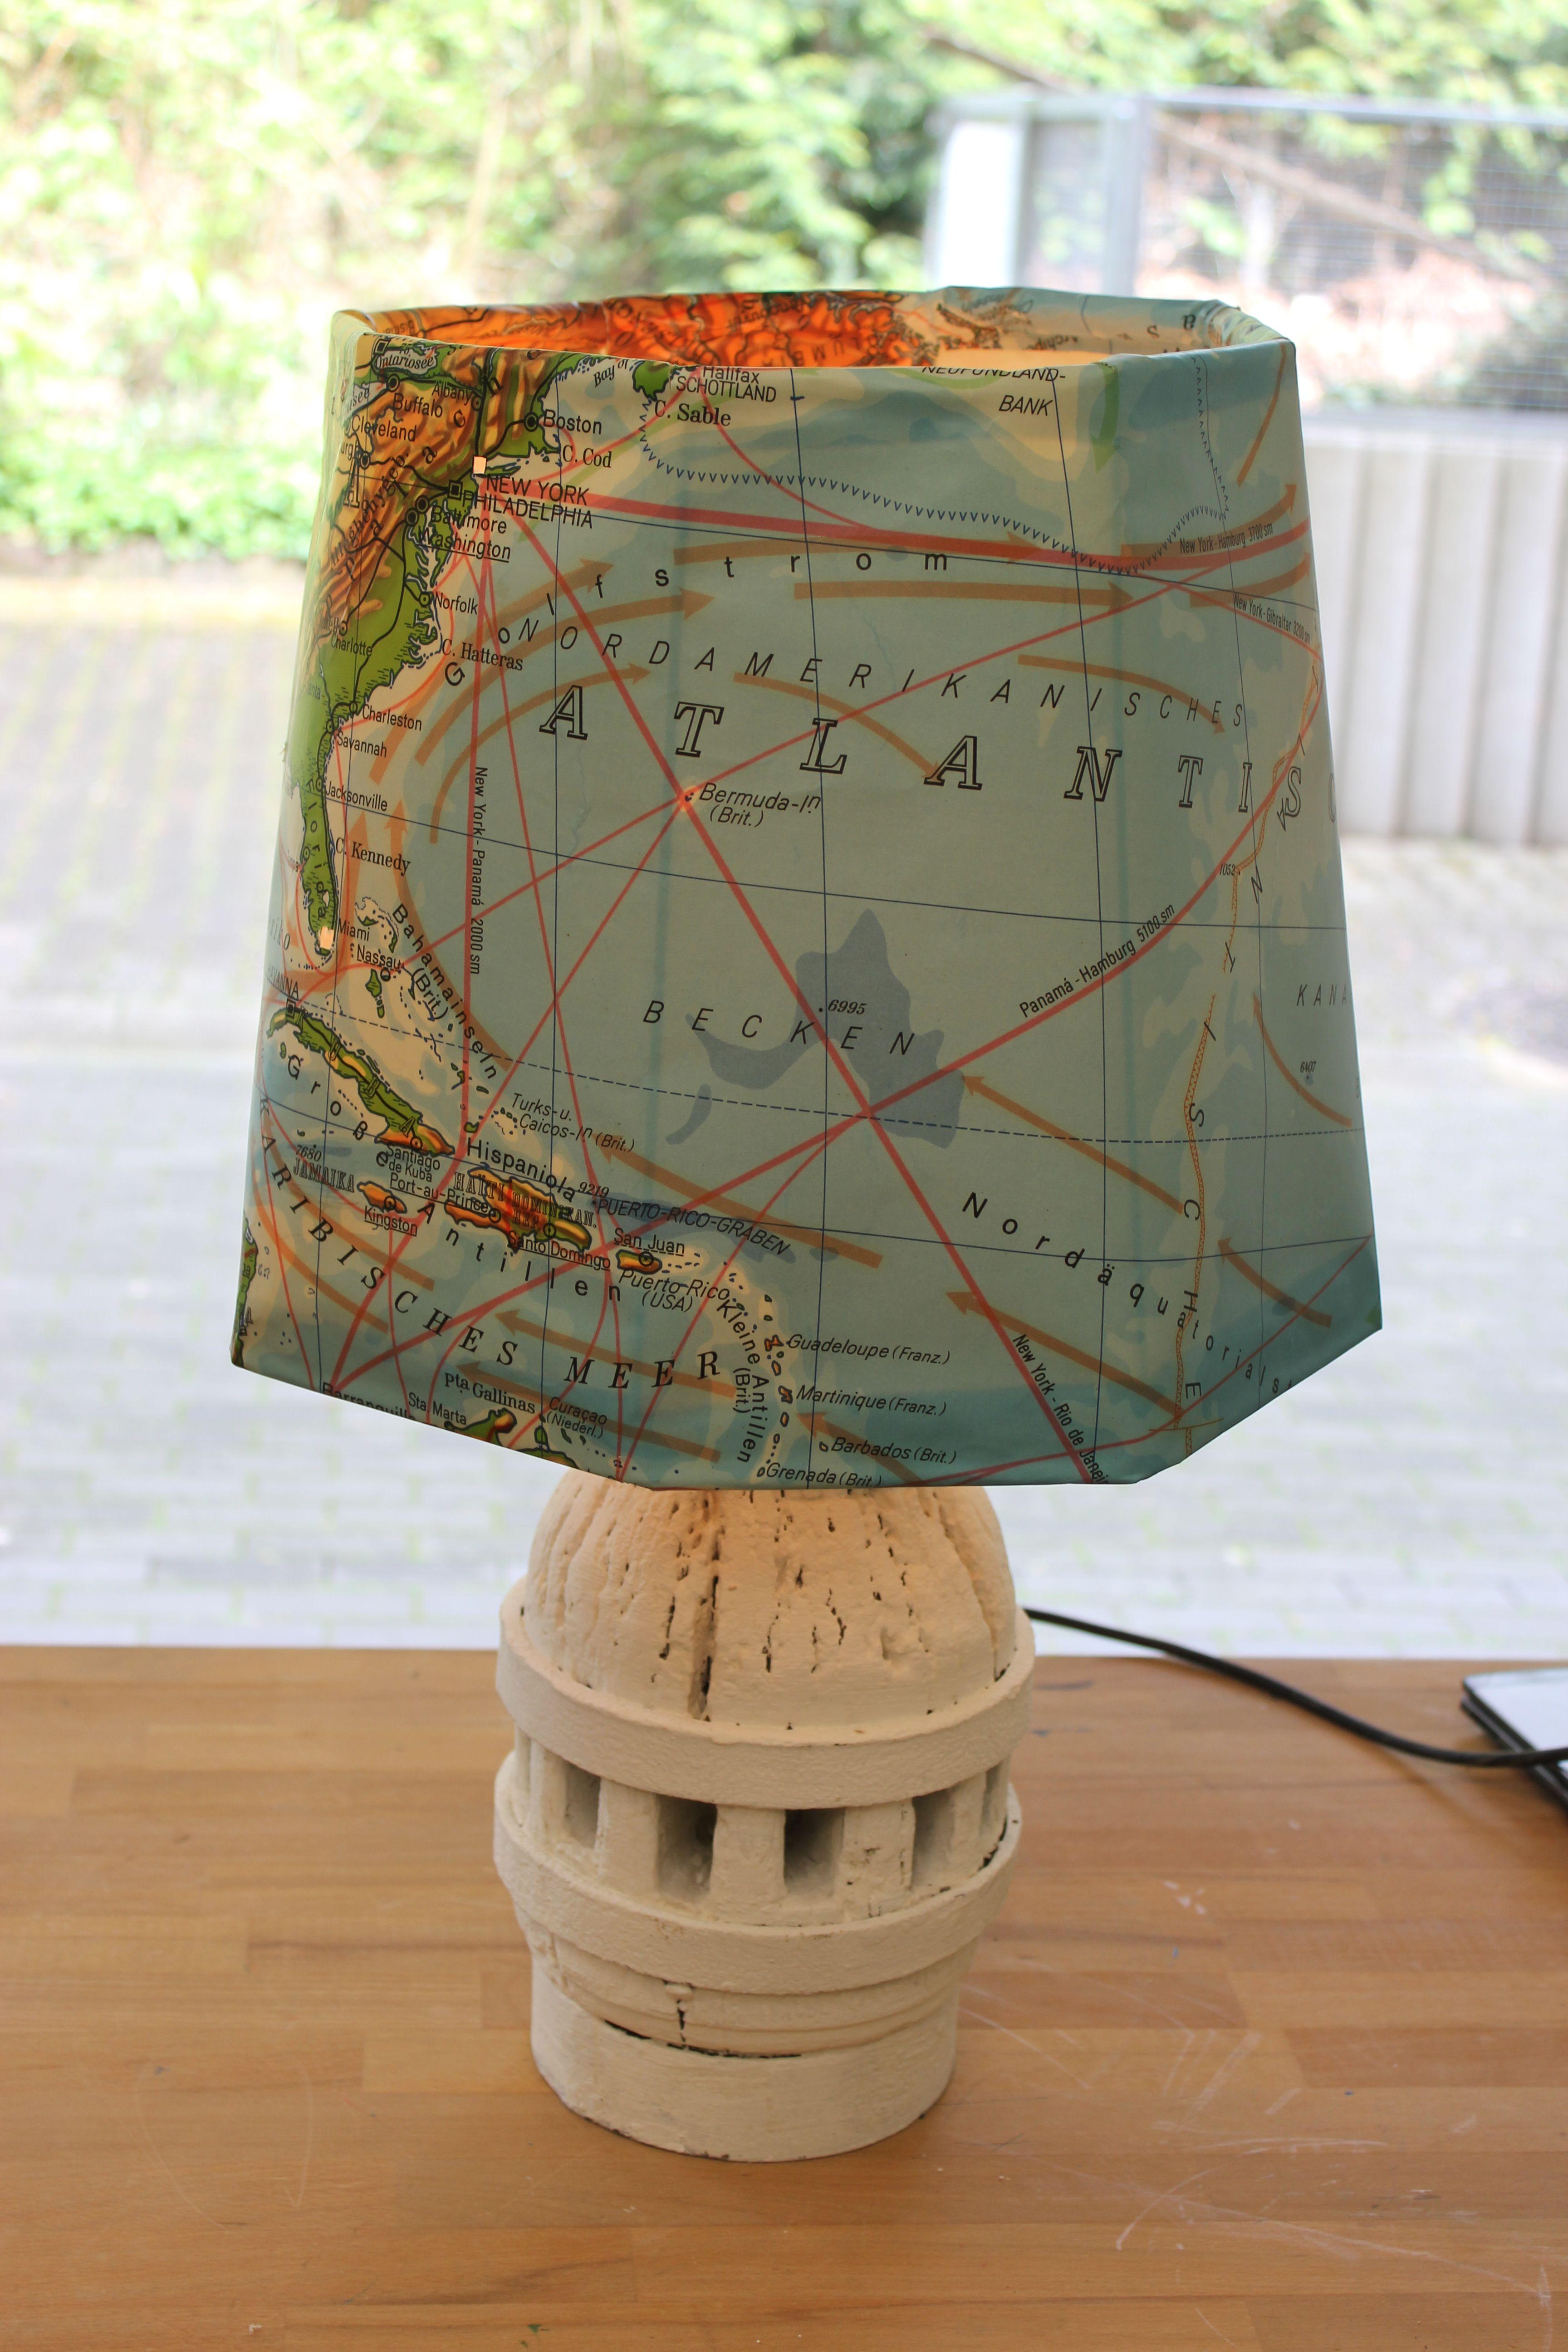 21e40bcbd266434d7fba1a88d65a5e63 Schöne Was ist Eine Lampe Dekorationen